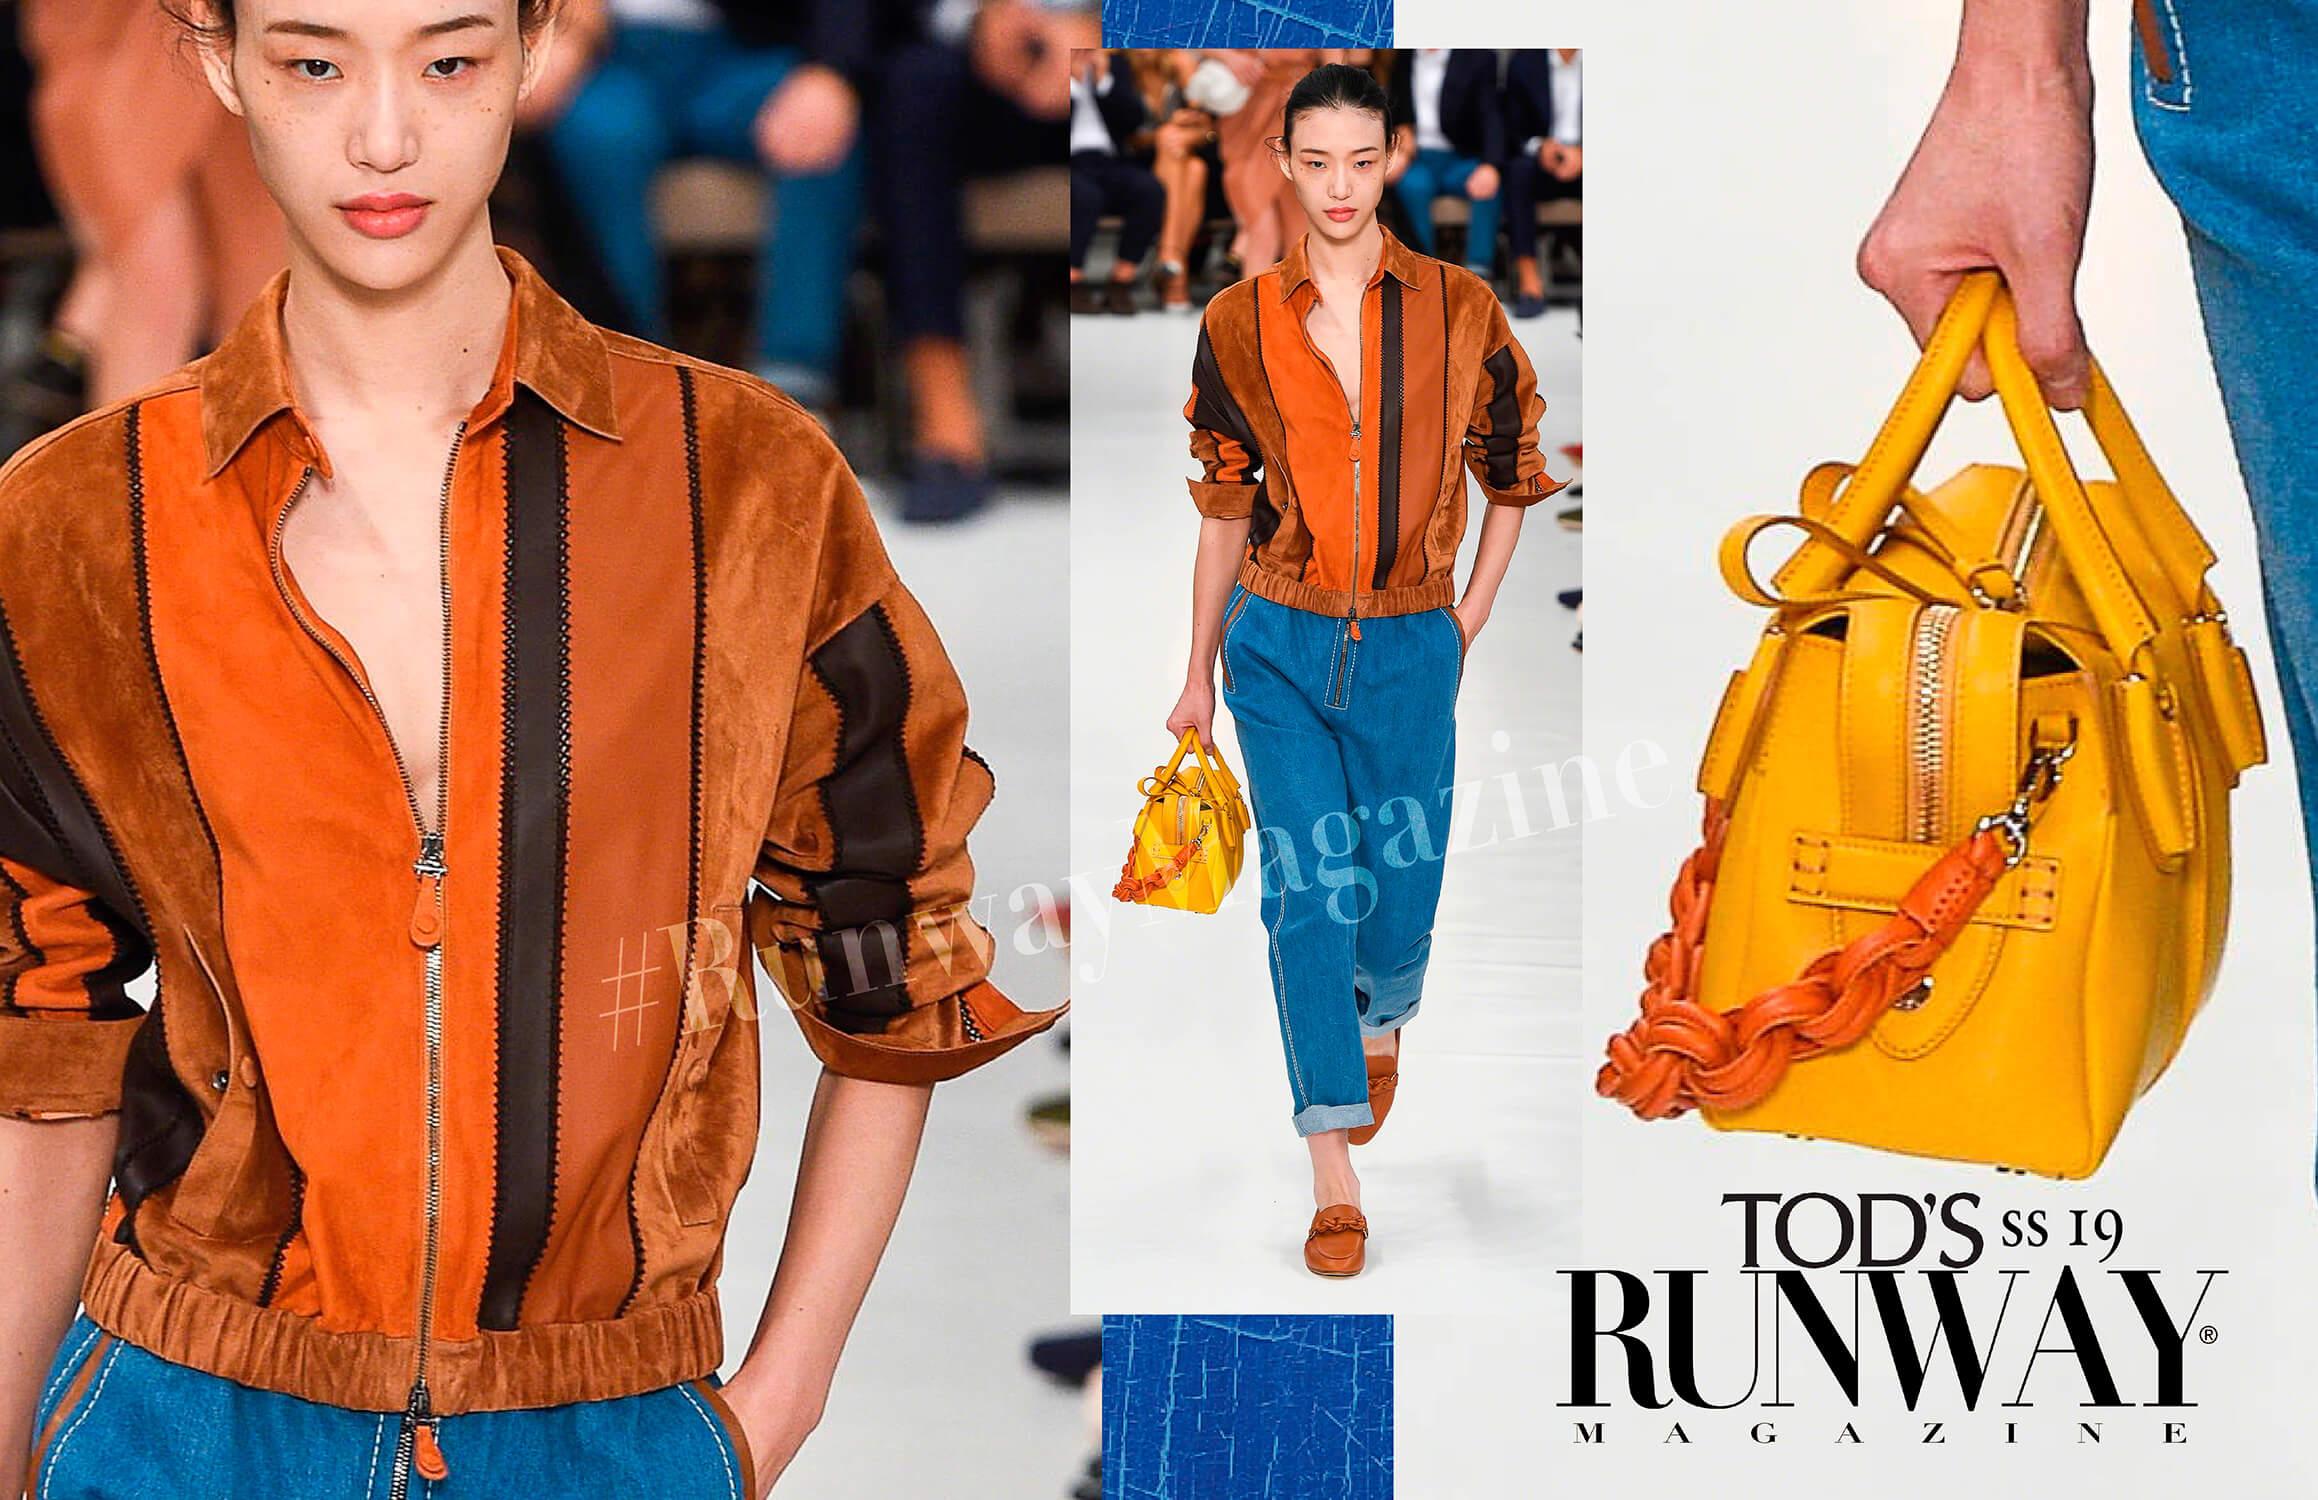 TOD'S Spring Summer 19 Milan by Runway Magazine